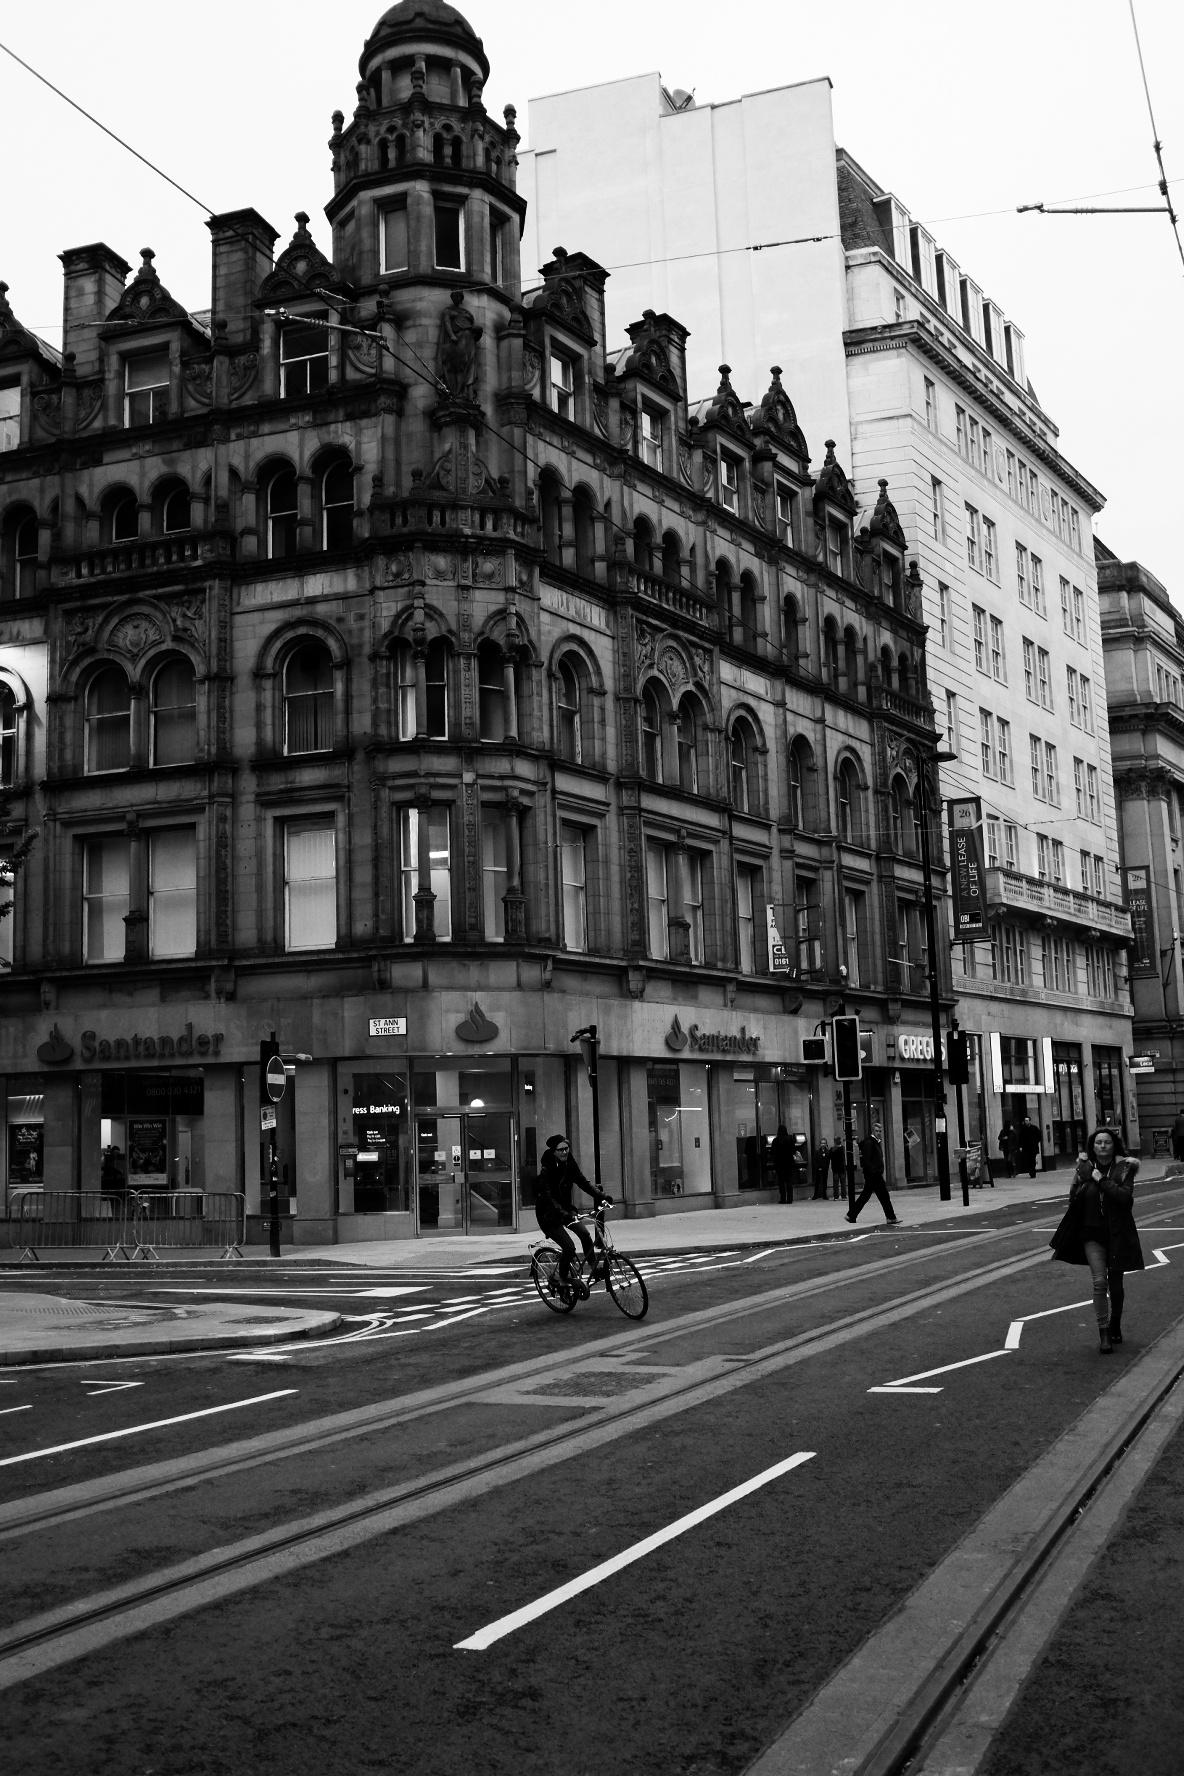 Manchester, UK 2016